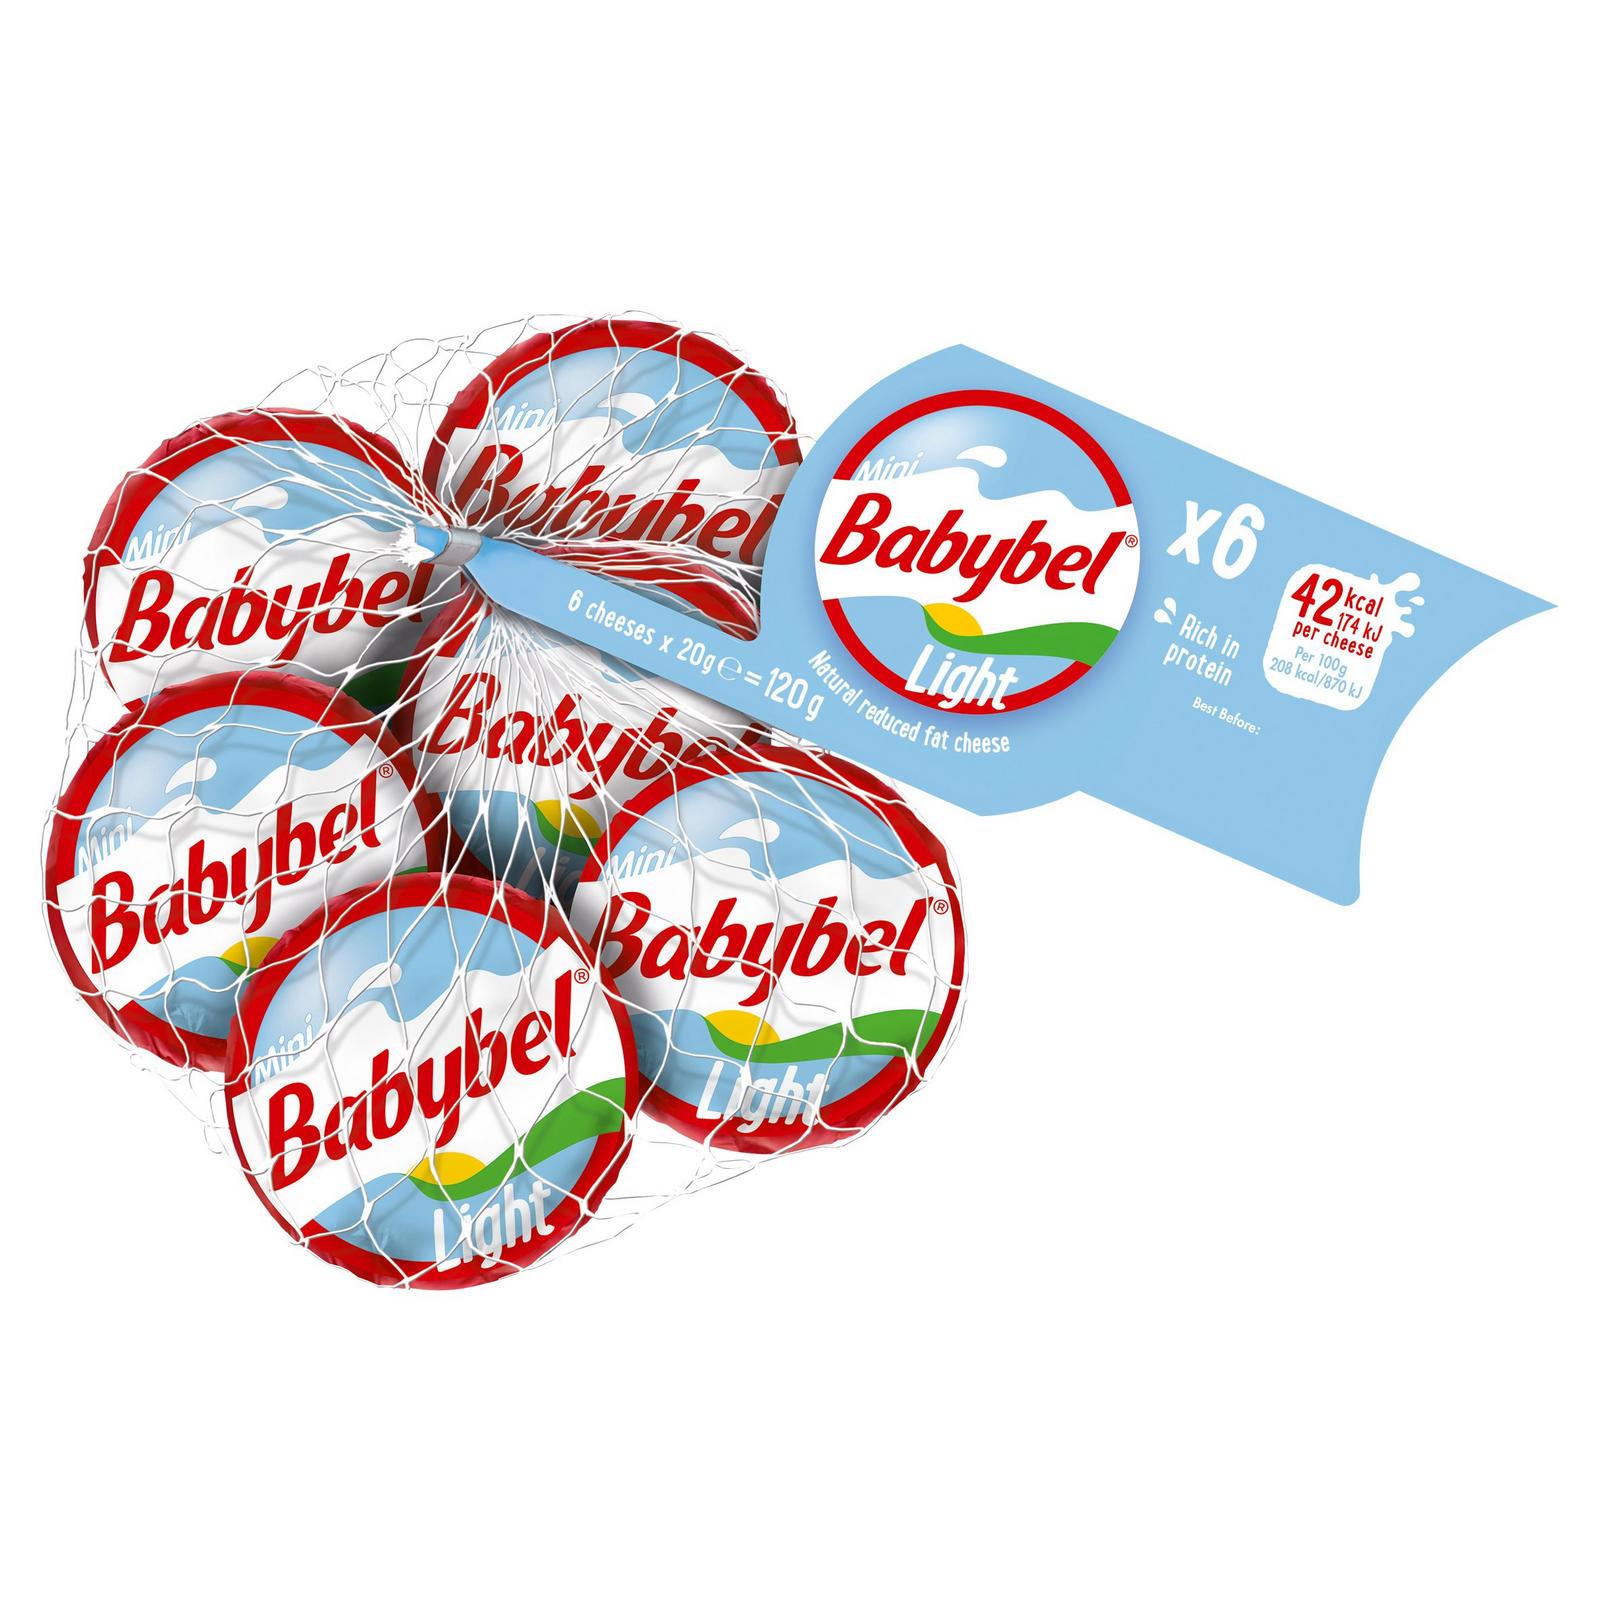 Mini Babybel Light Reduced Fat Natural Cheese Snacks 6 x 20g (120g)